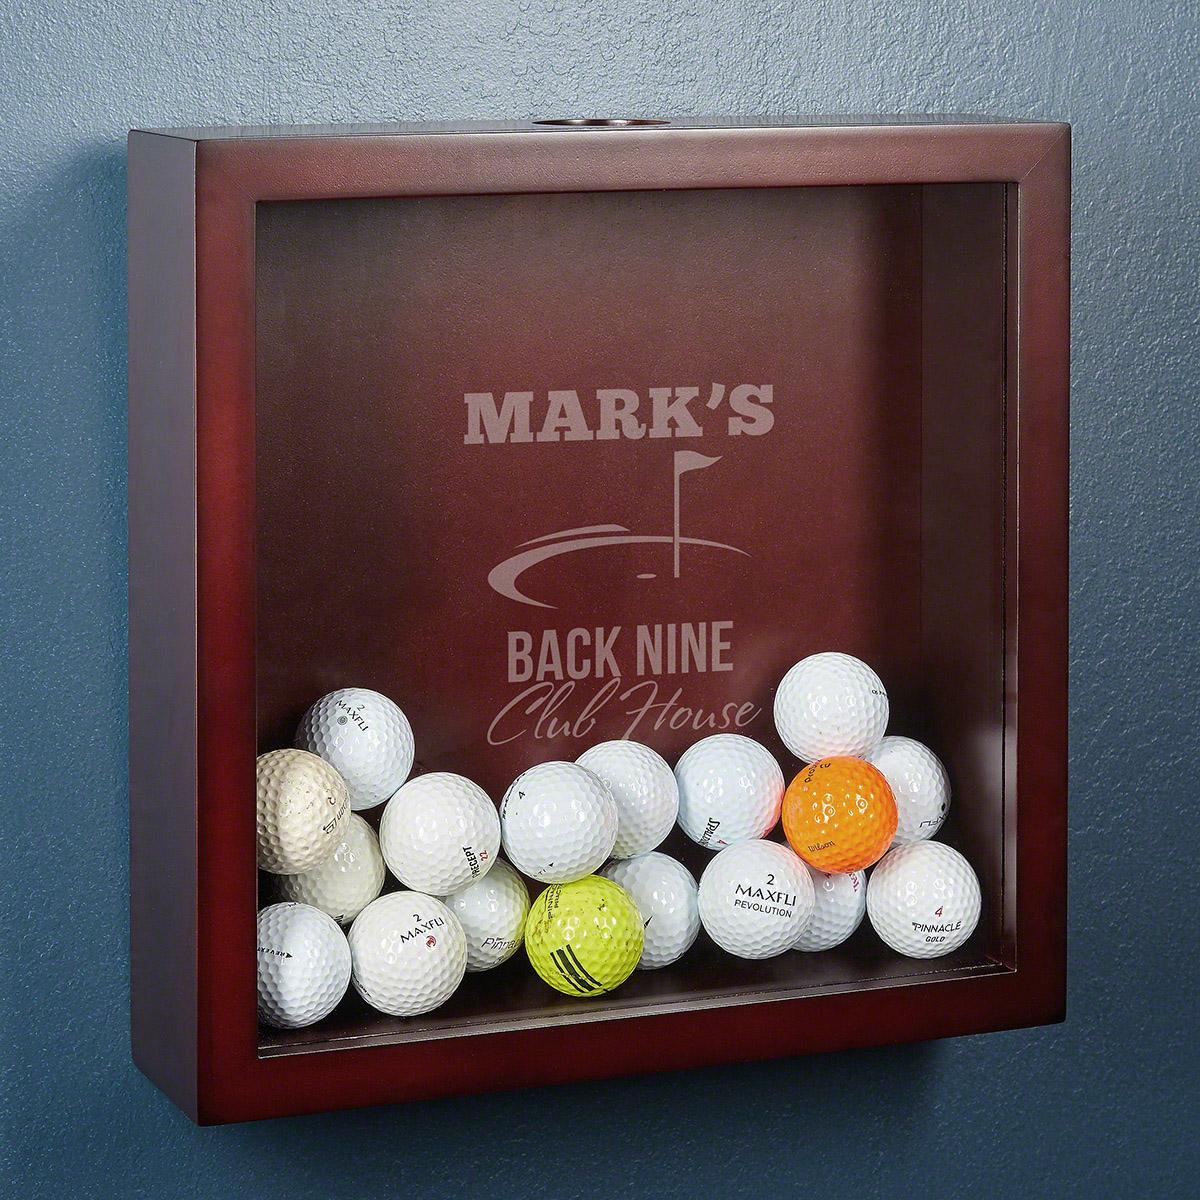 Back Nine Club House Personalized Golf Shadow Box